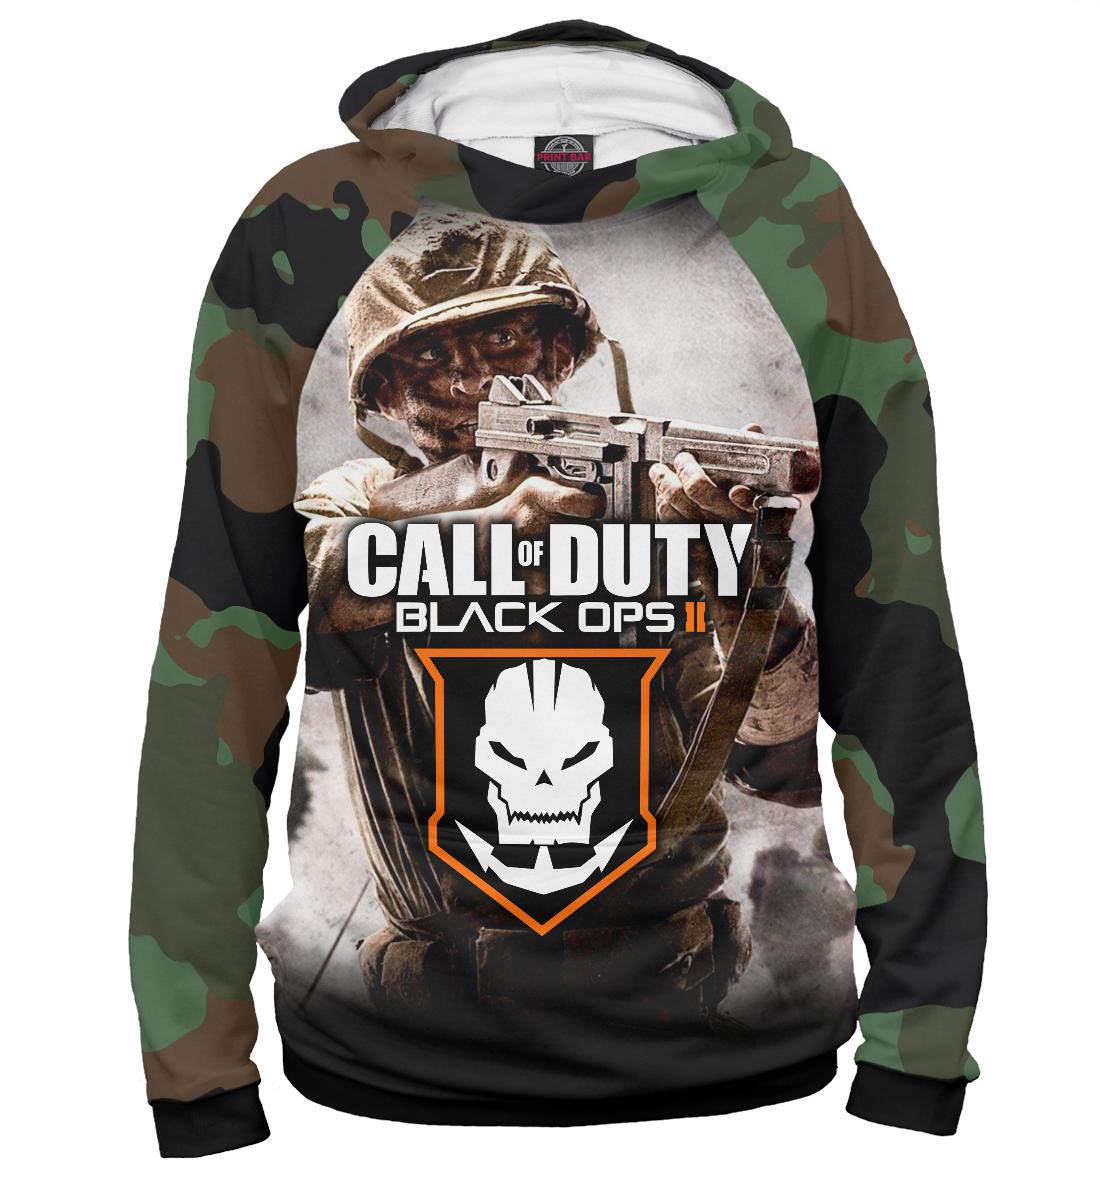 Call of Duty duty